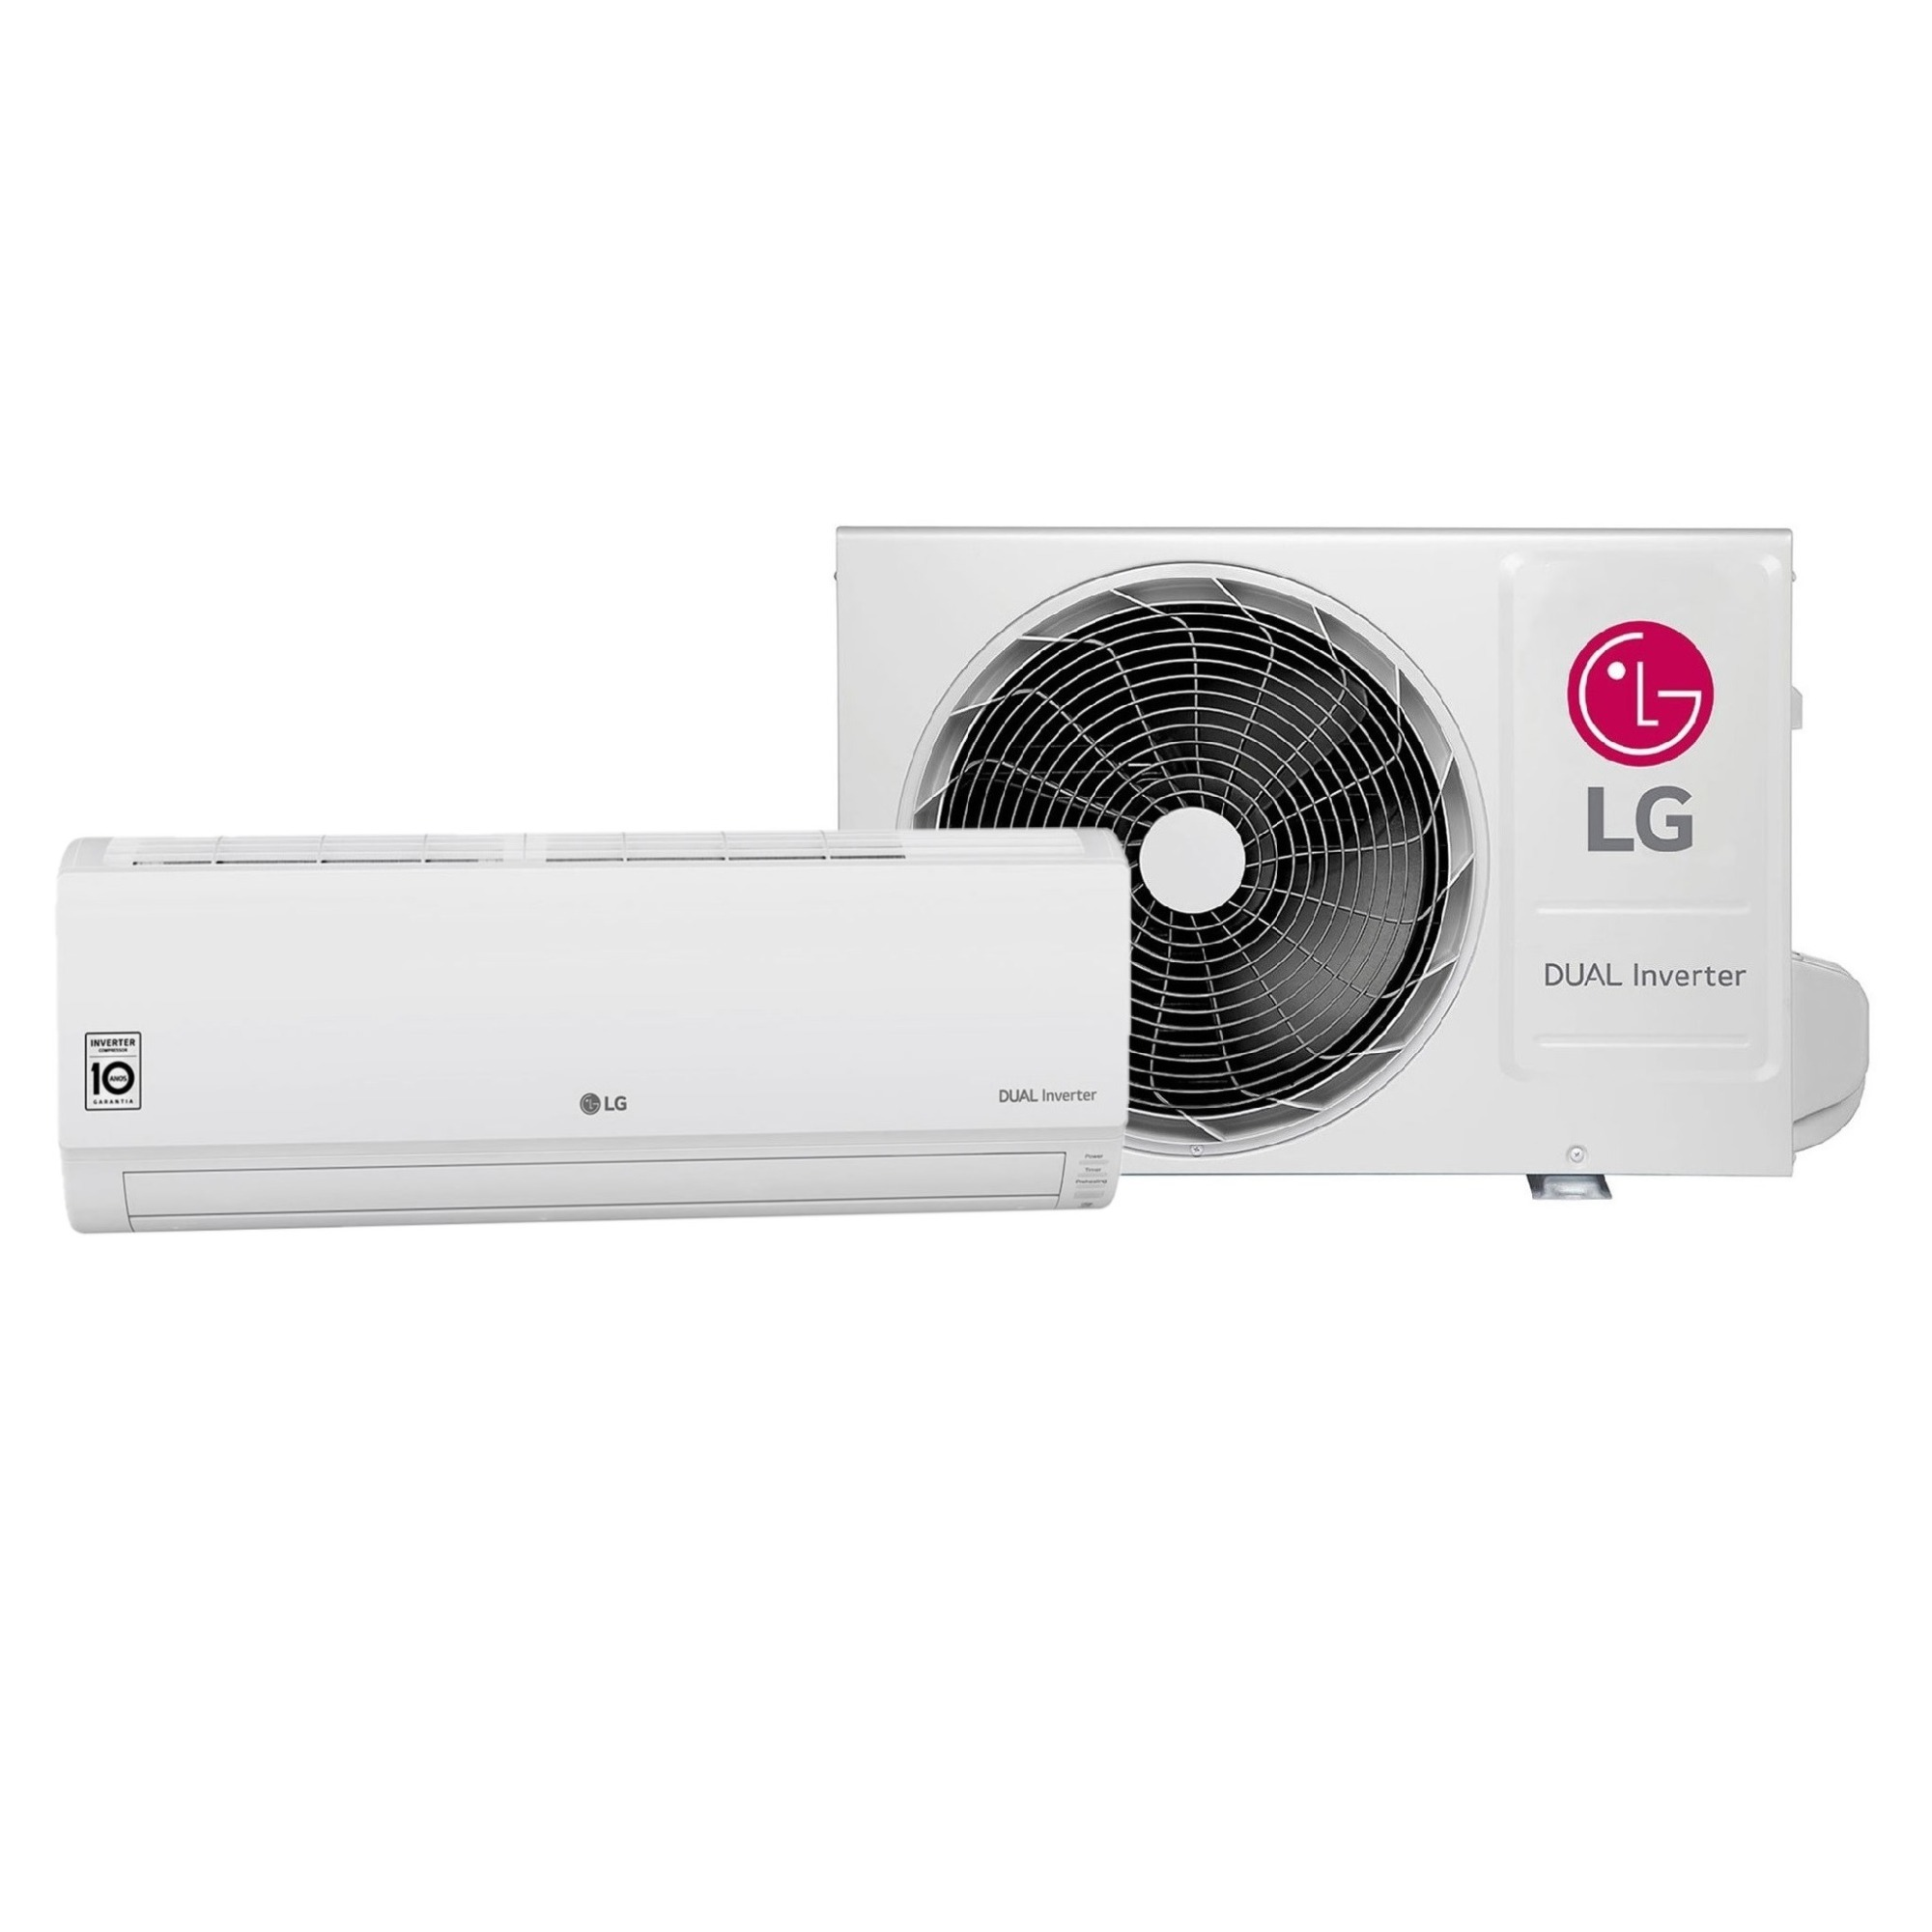 Ar Condicionado Split Dual Inverter LG 9000 BTUs 220V - Frio - S4NQ09WA5AA